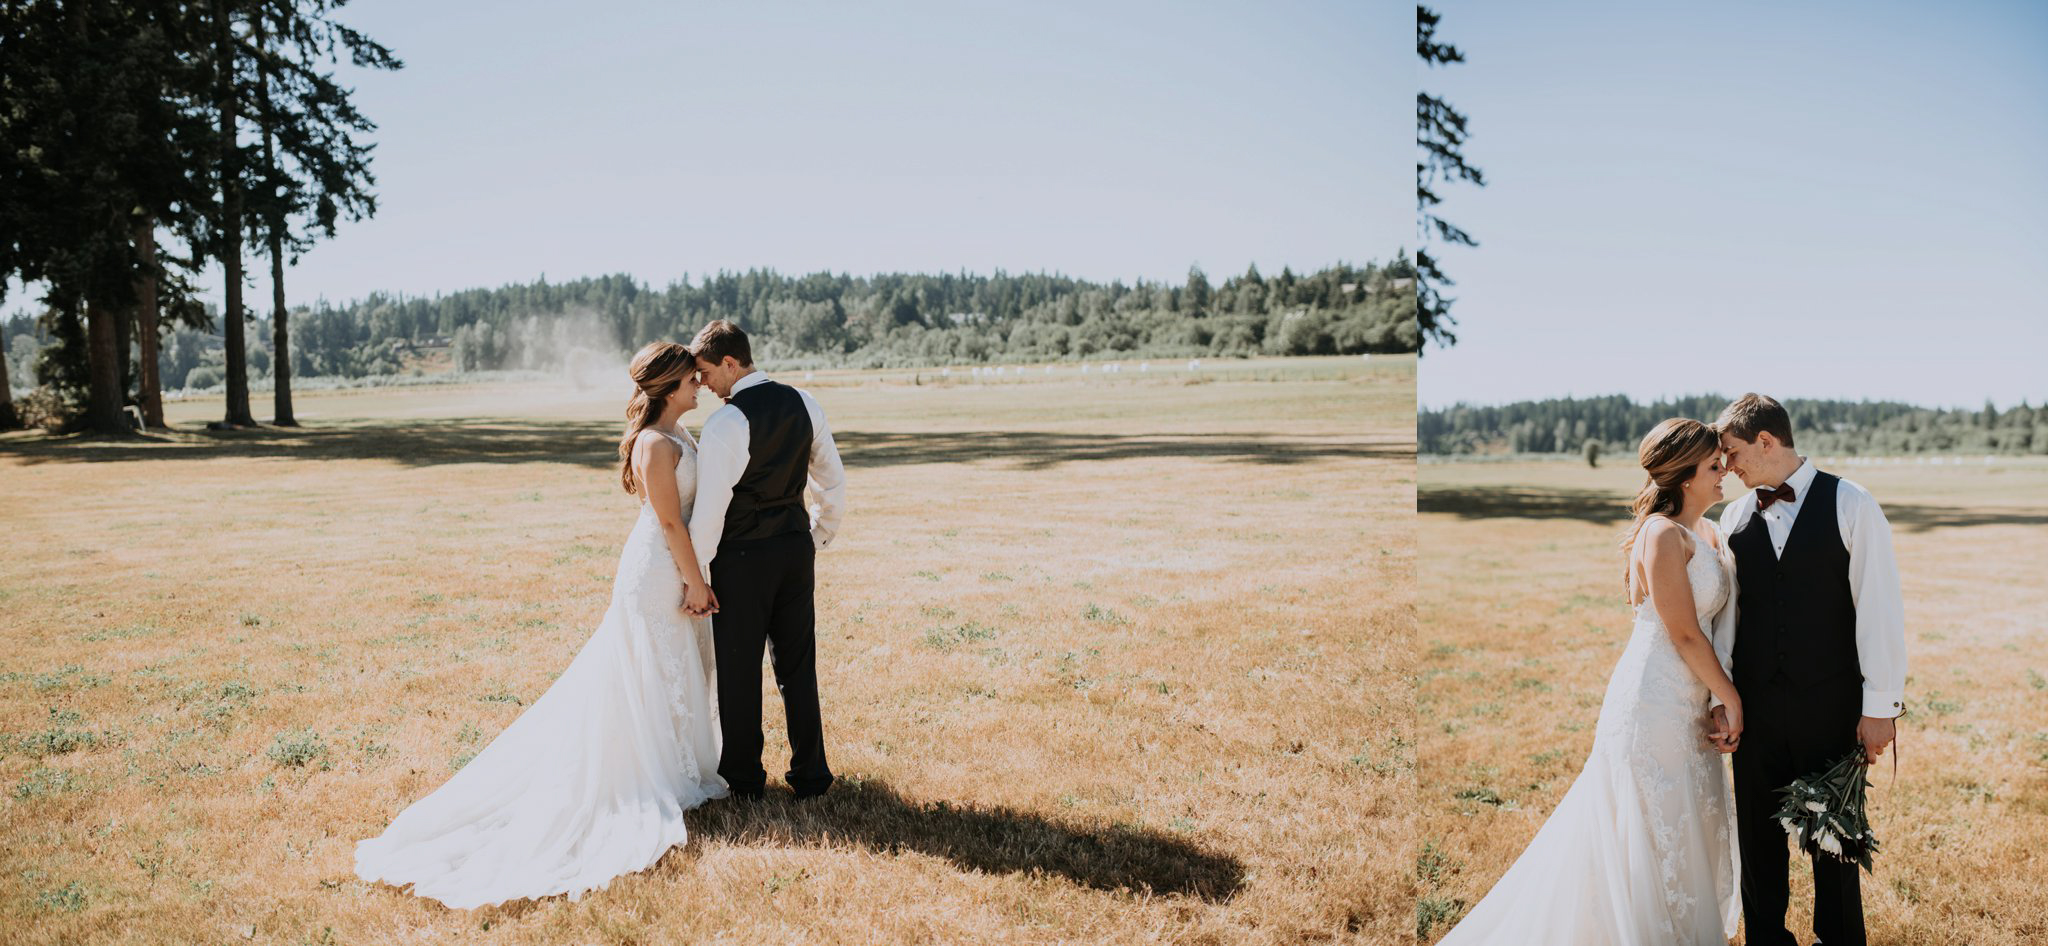 kristen-and-cody-the-kelley-farm-wedding-seattle-photographer-caitlyn-nikula-46.jpg